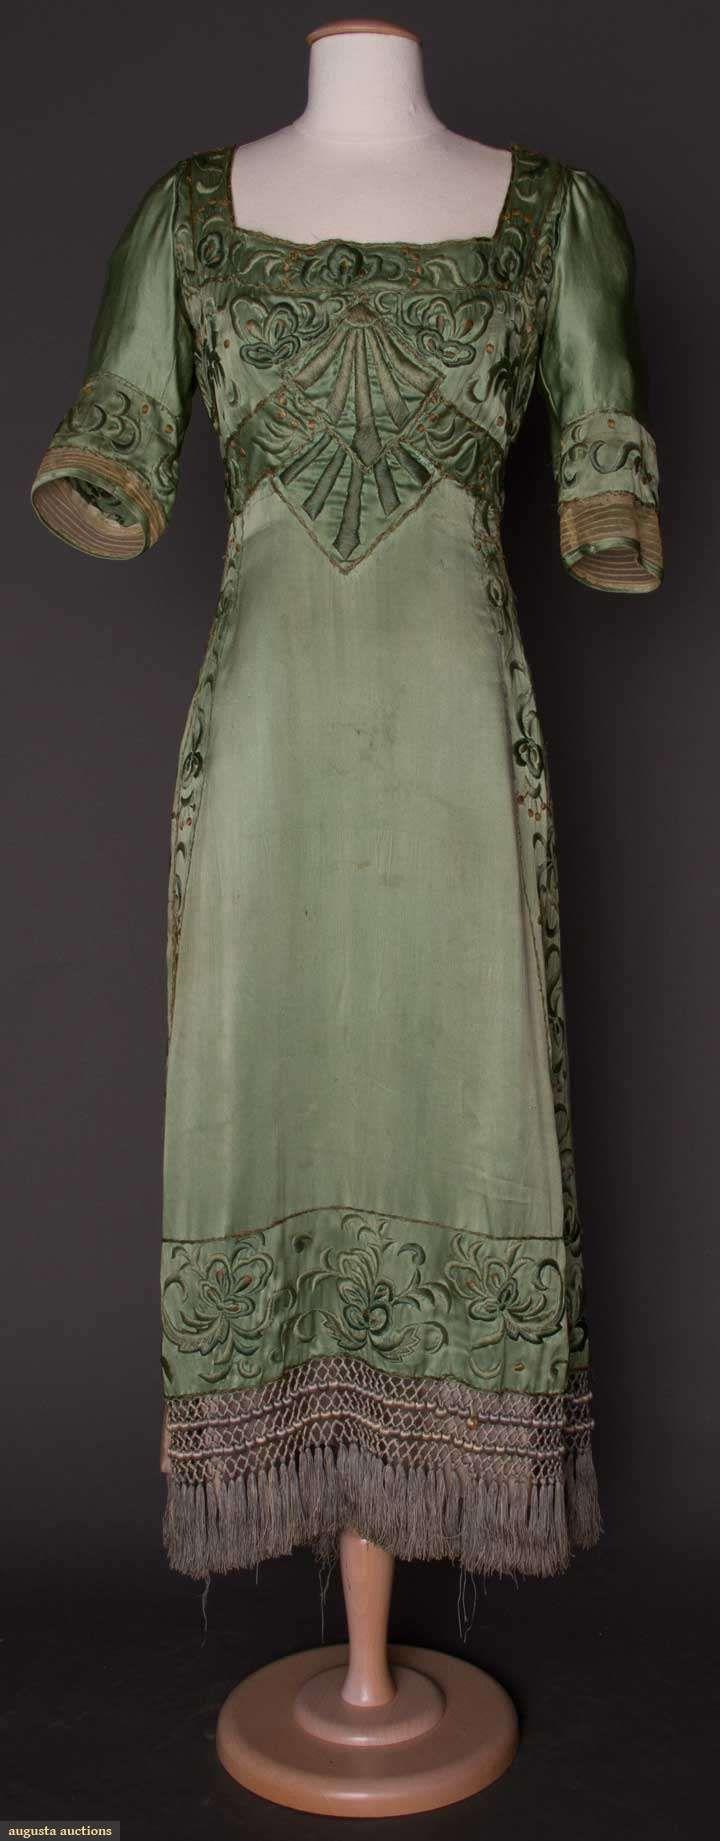 1910 sage green satin Arts and Crafts dress.